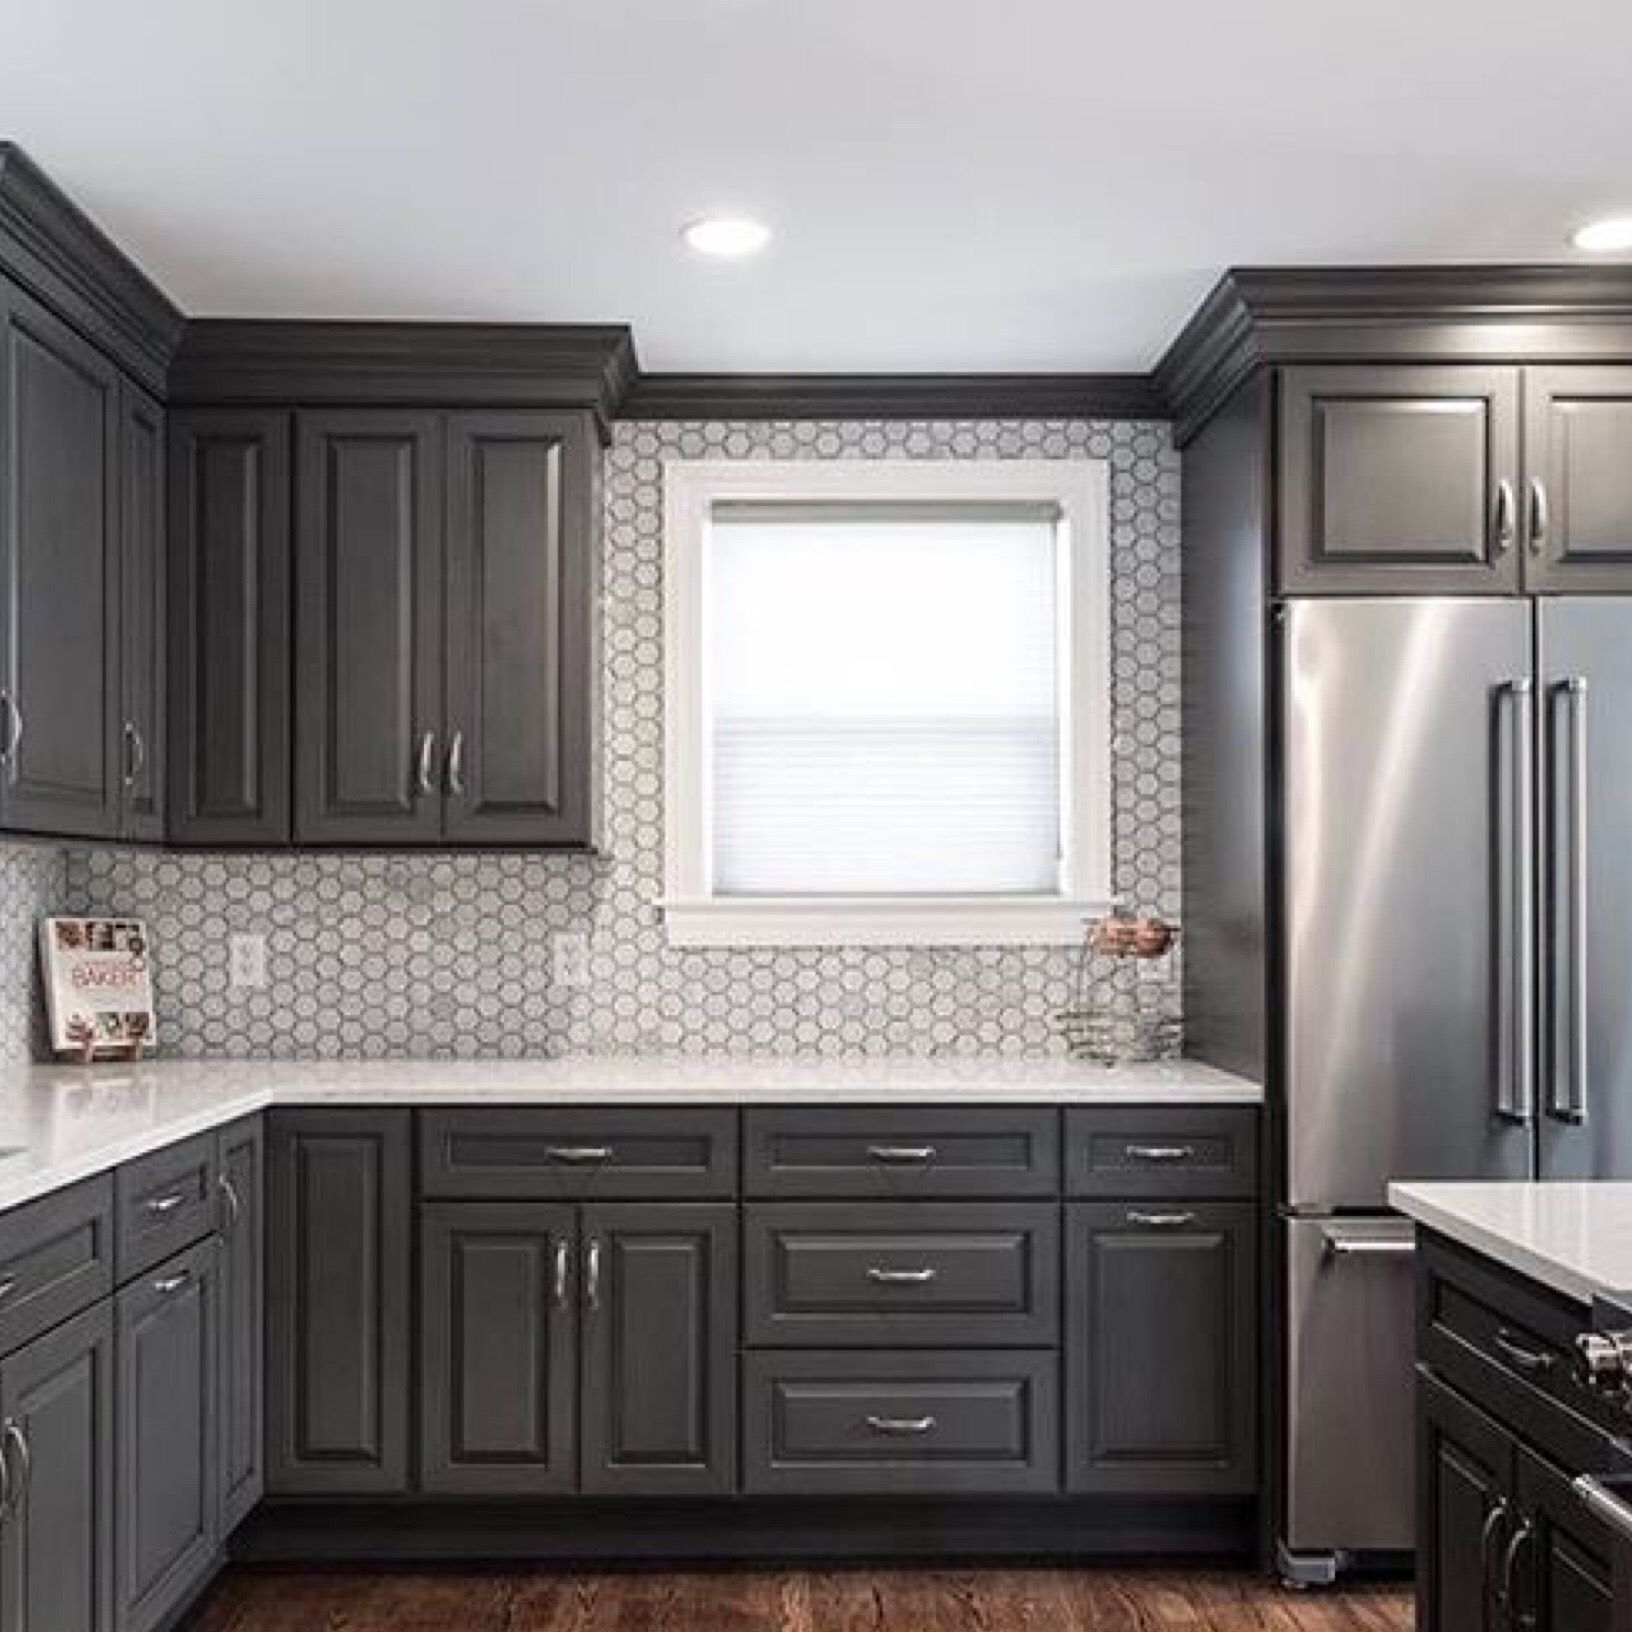 Tile by Tilebar | Home decor, Dark grey kitchen cabinets ...